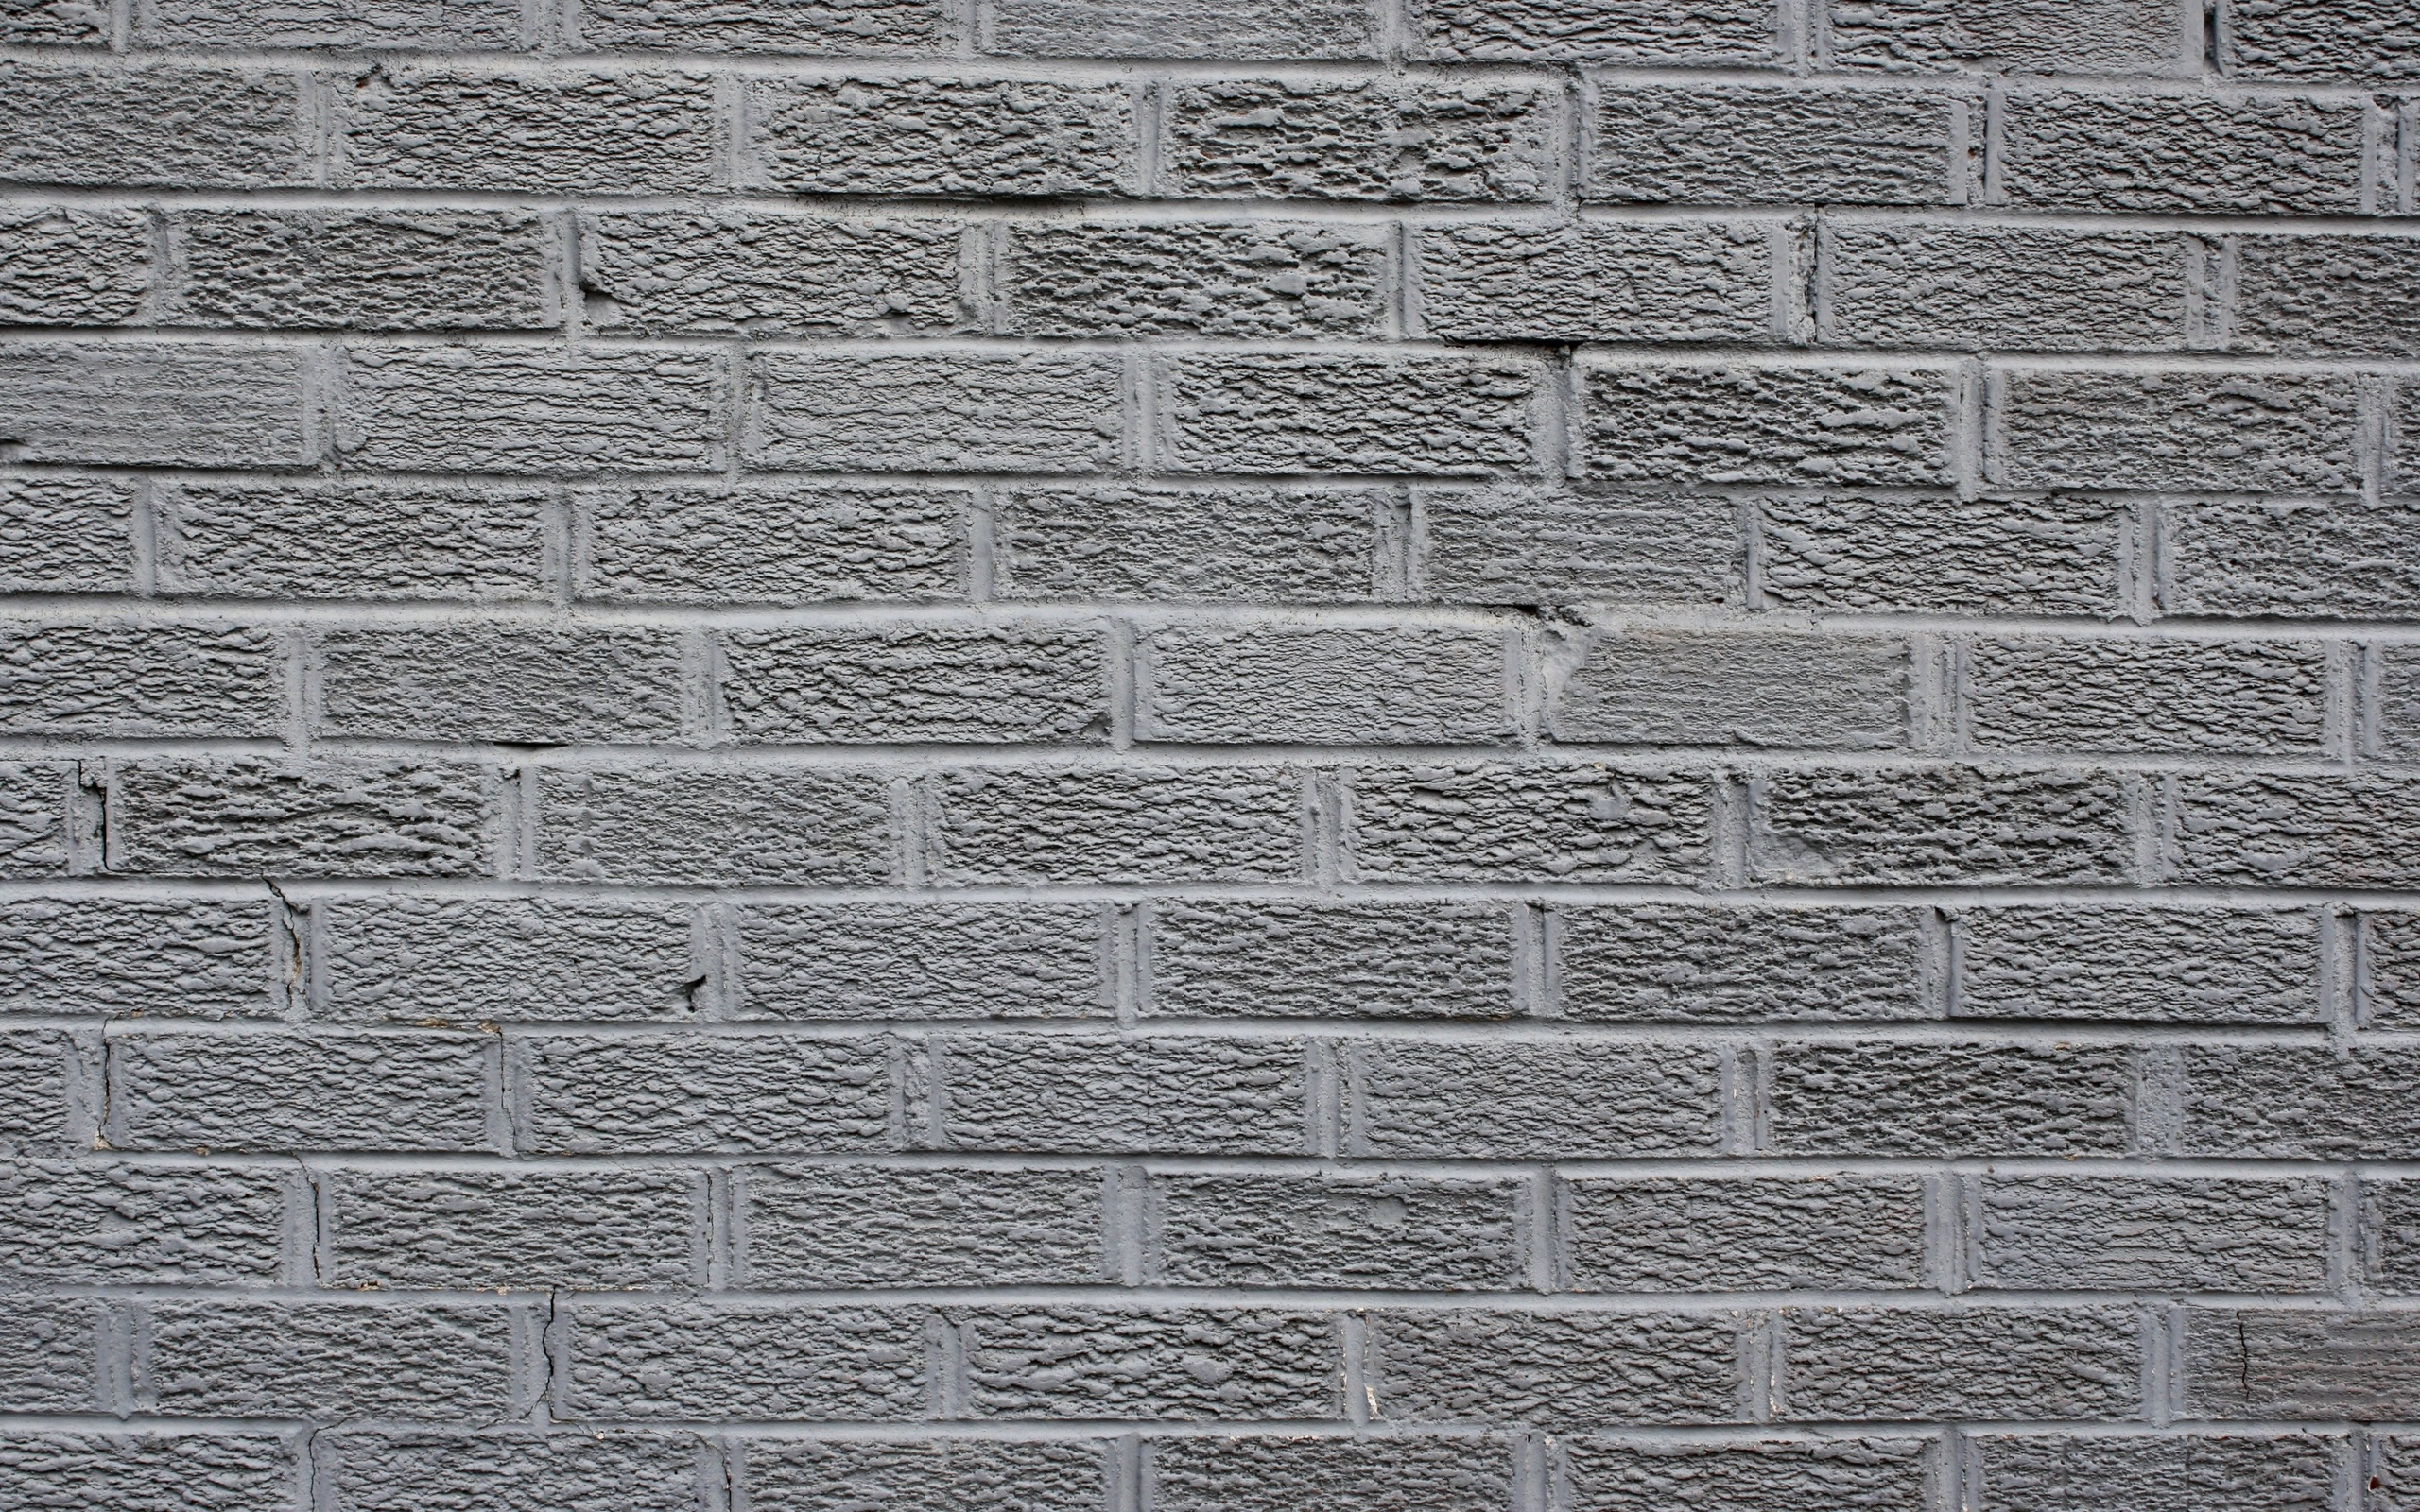 51 Brick HD Wallpapers